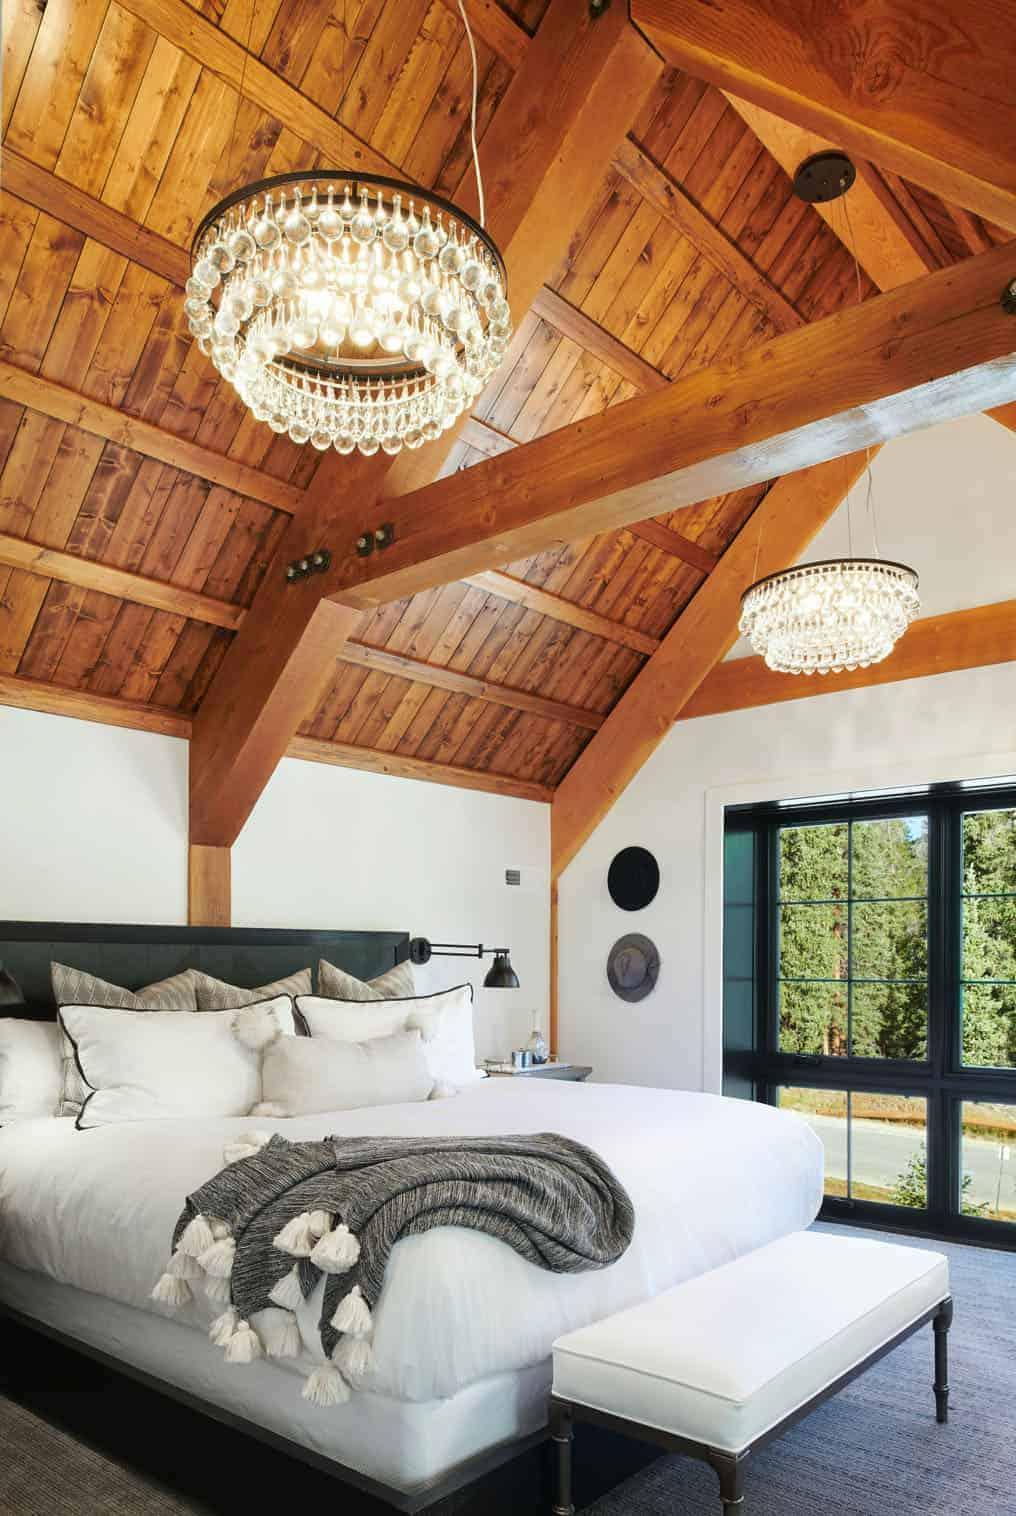 midwestern-barn-inspired-bedroom